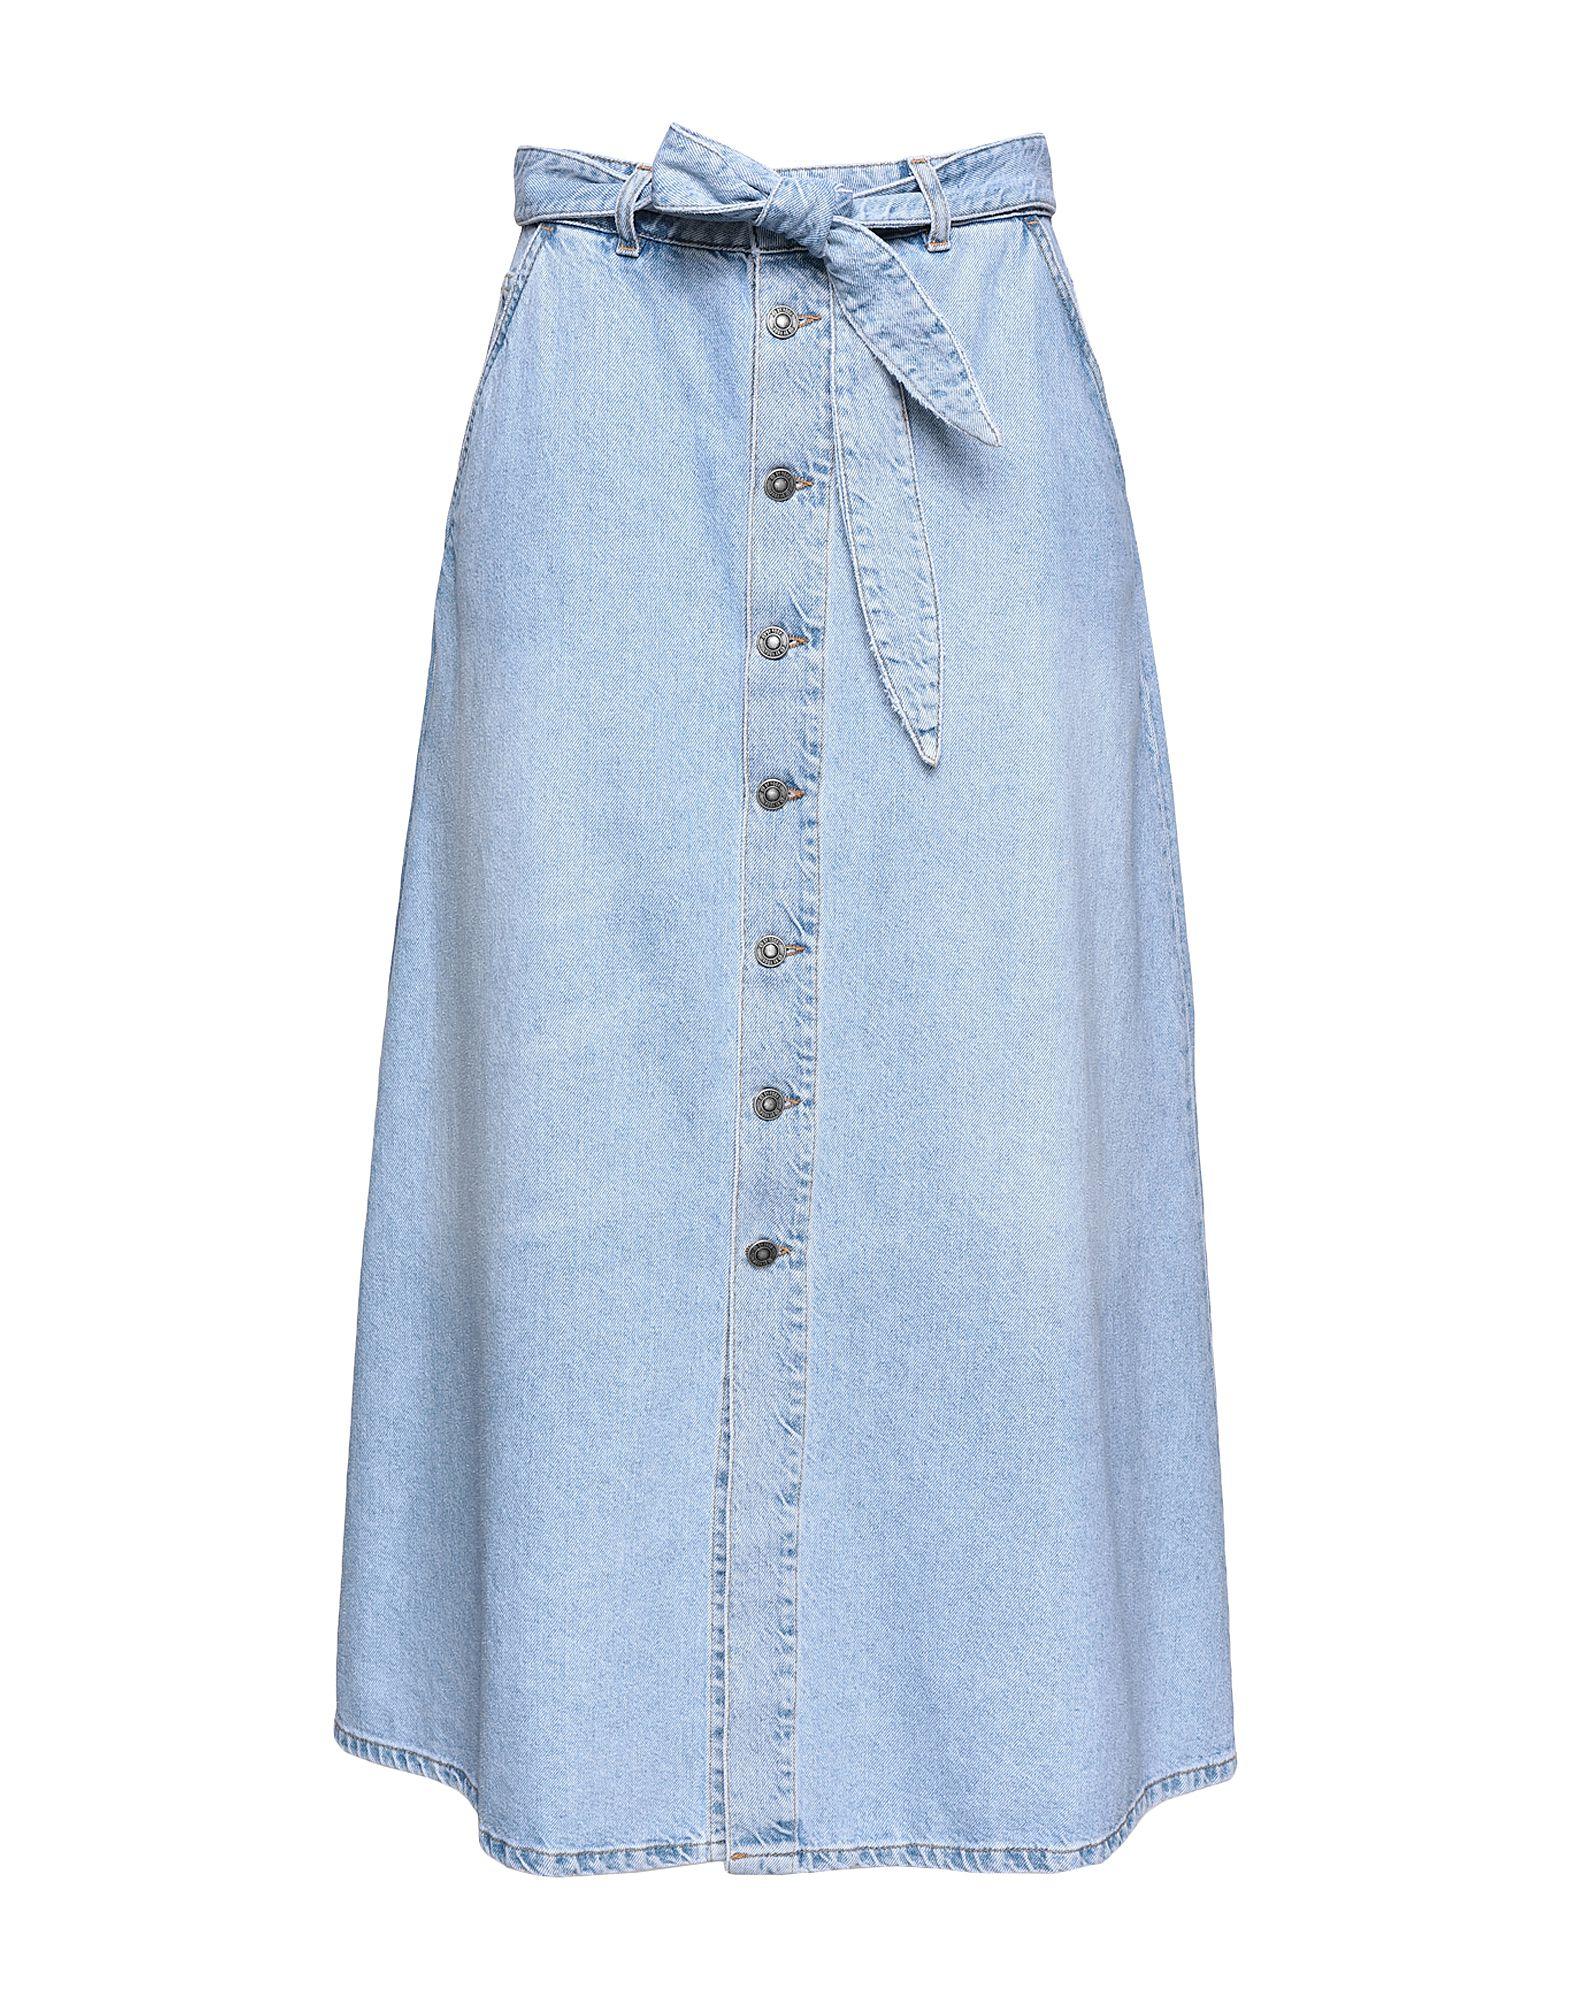 8 by YOOX Джинсовая юбка 8 by yoox джинсовая верхняя одежда